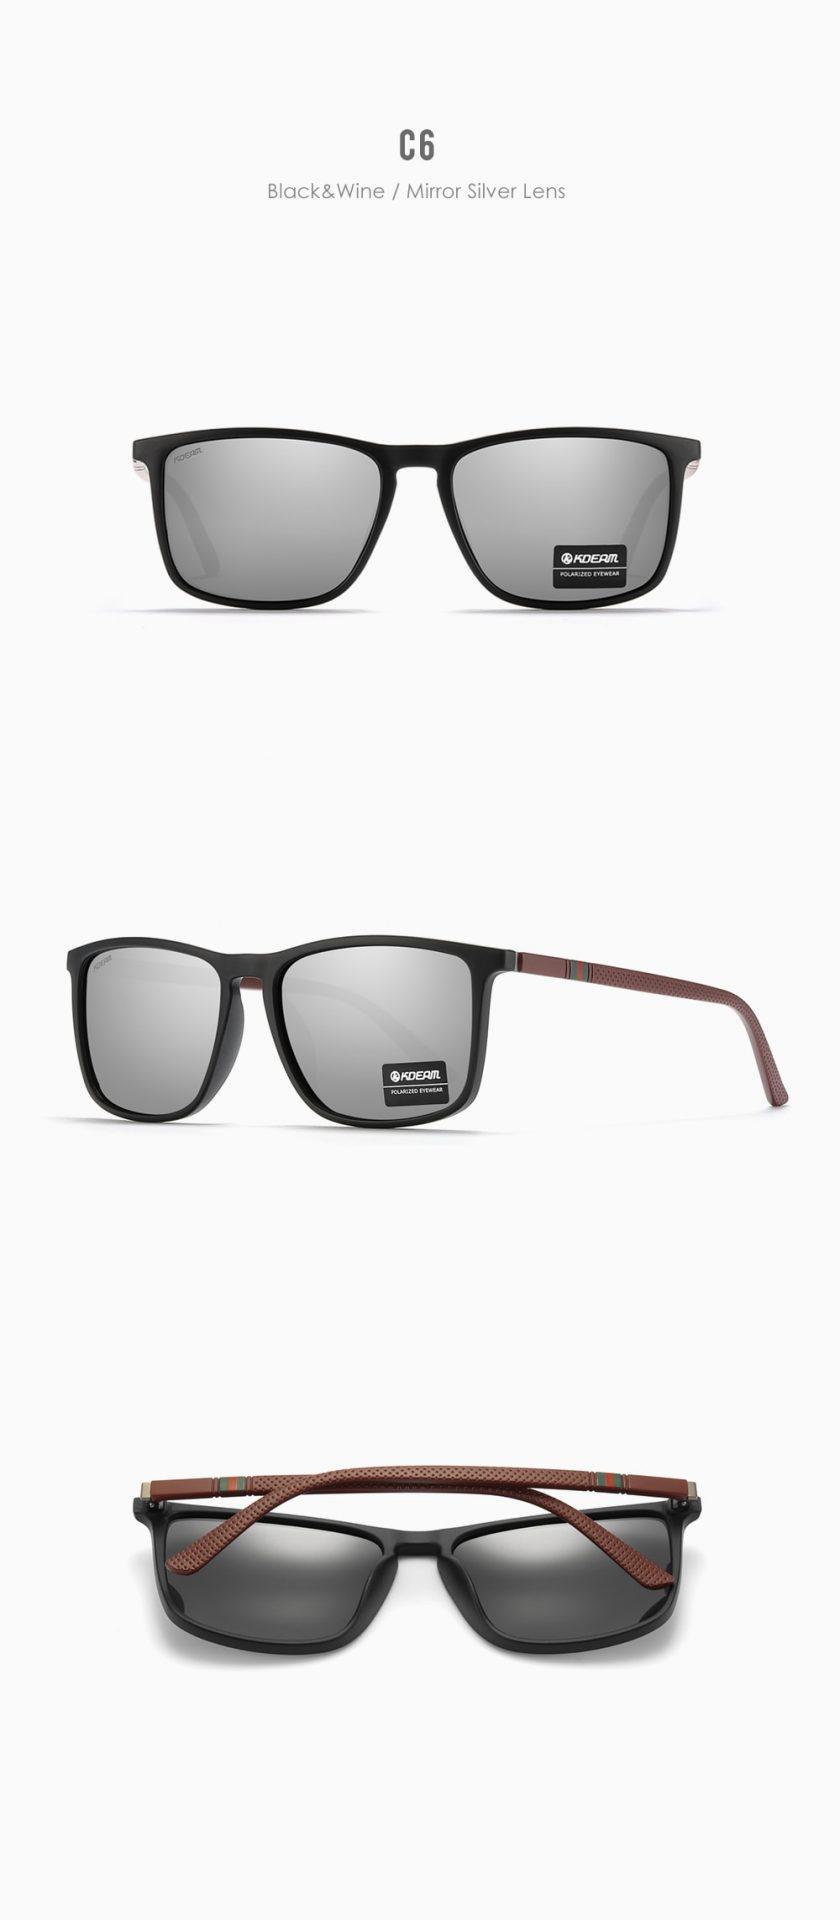 New Luxury Polarized Sunglasses Men's